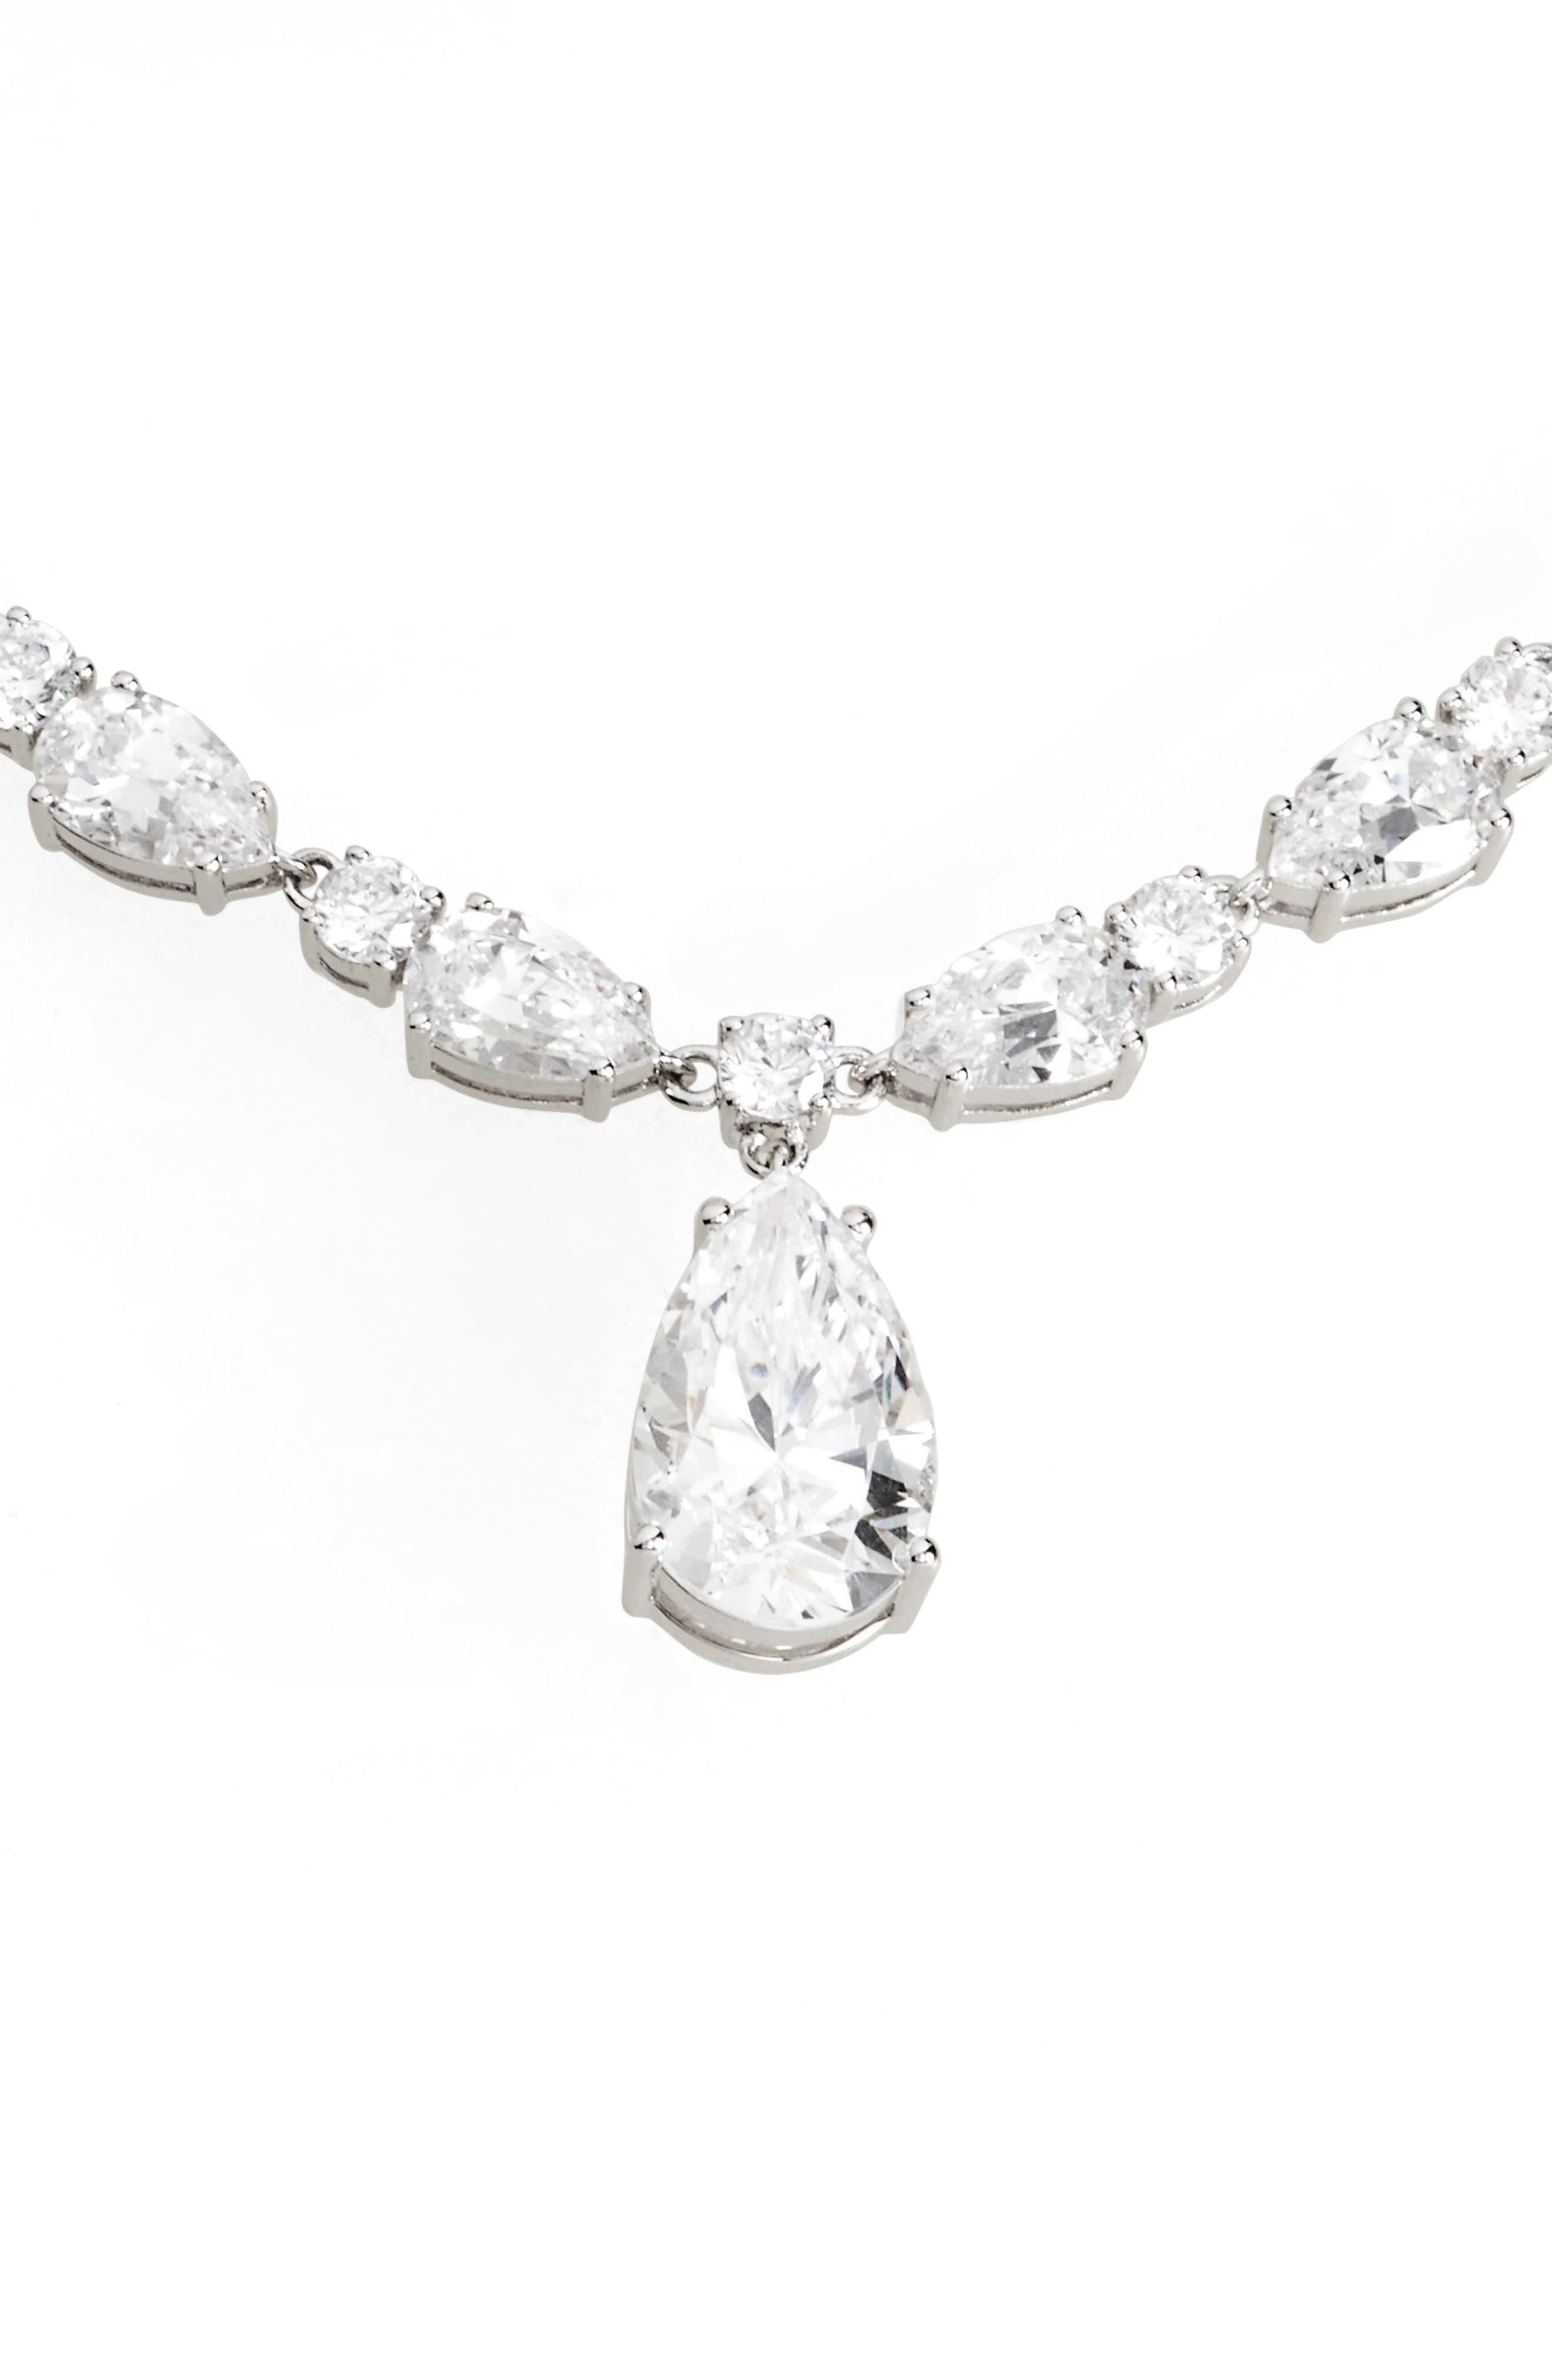 All Around Cubic Zirconia Pendant Necklace,                         Main,                         color, Silver